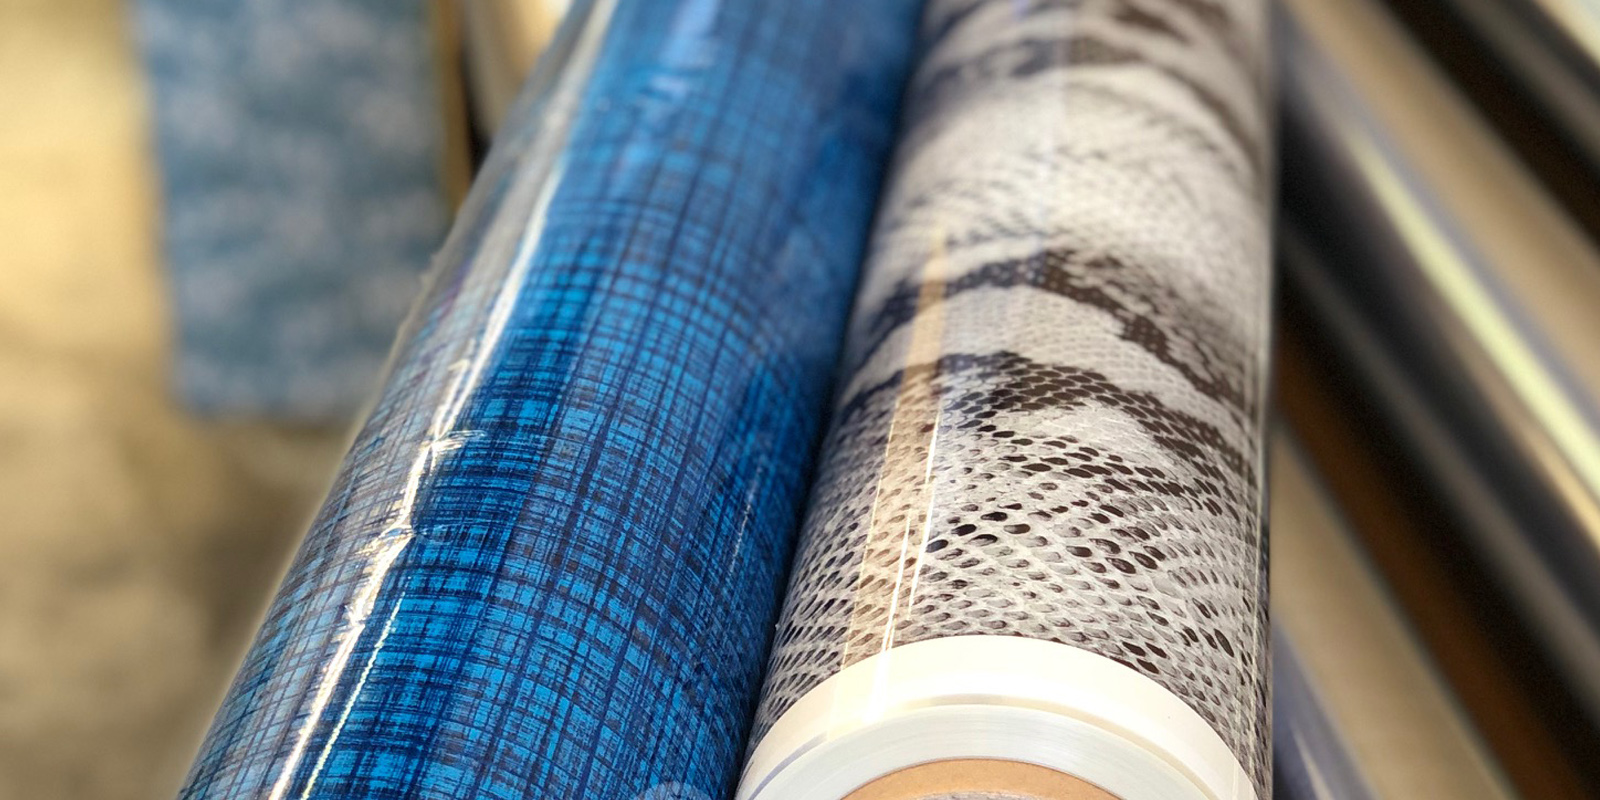 Disegni parziali per la stampa a caldo su pelli e tessuti